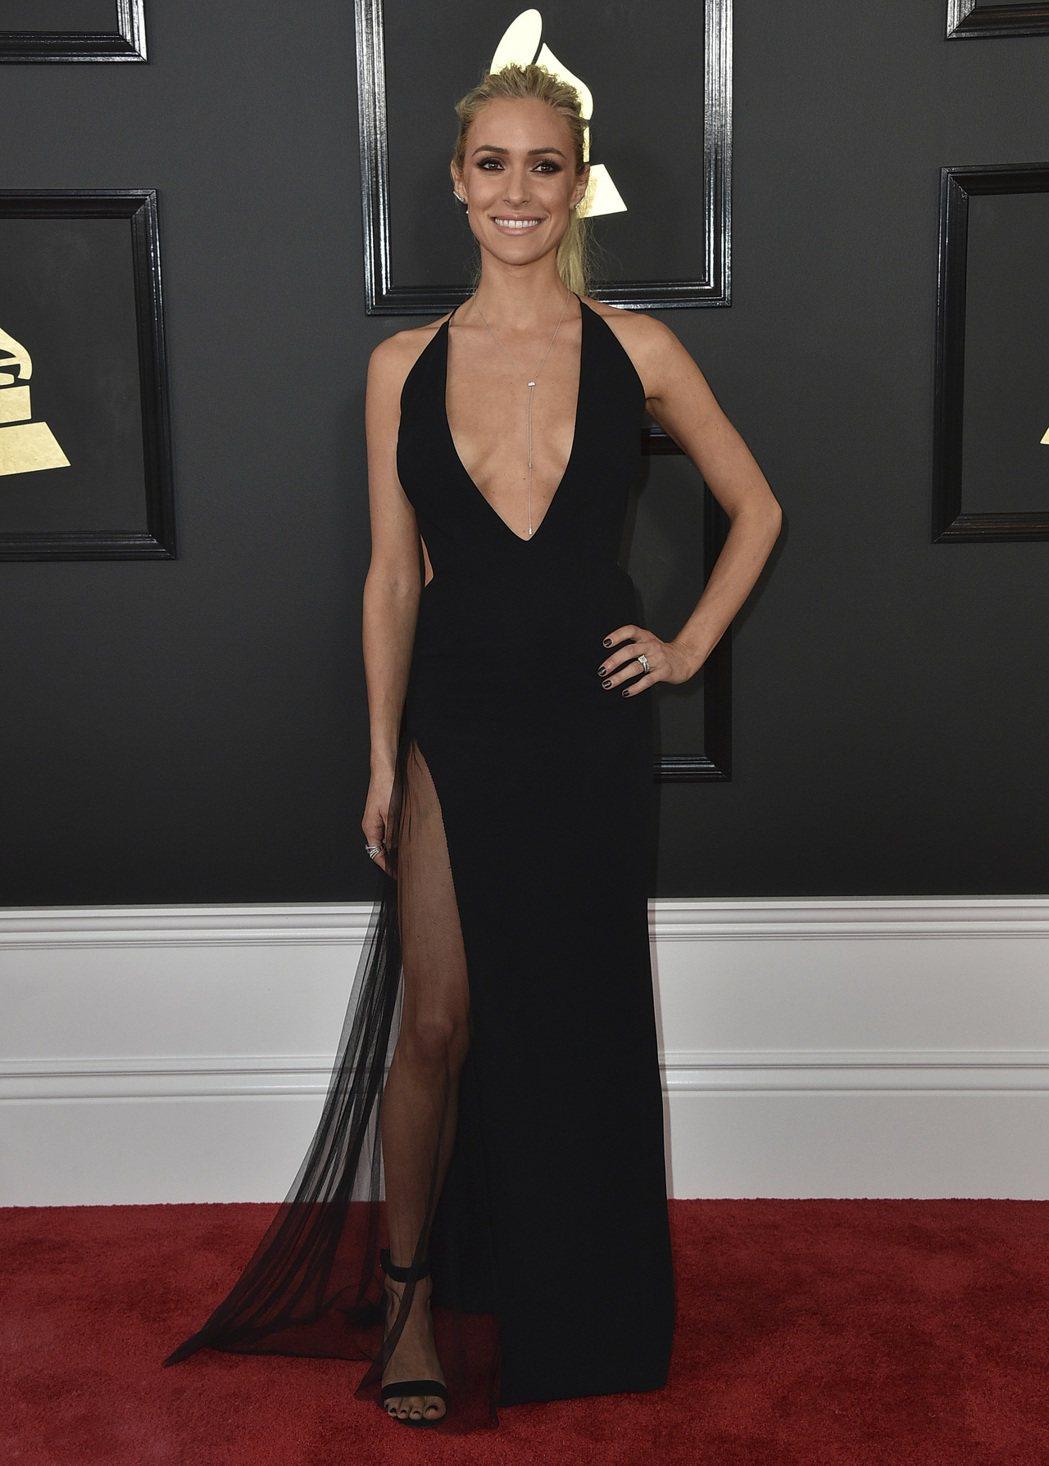 Kristin Cavallari出席第59屆葛萊美獎頒獎典禮。圖/美聯社